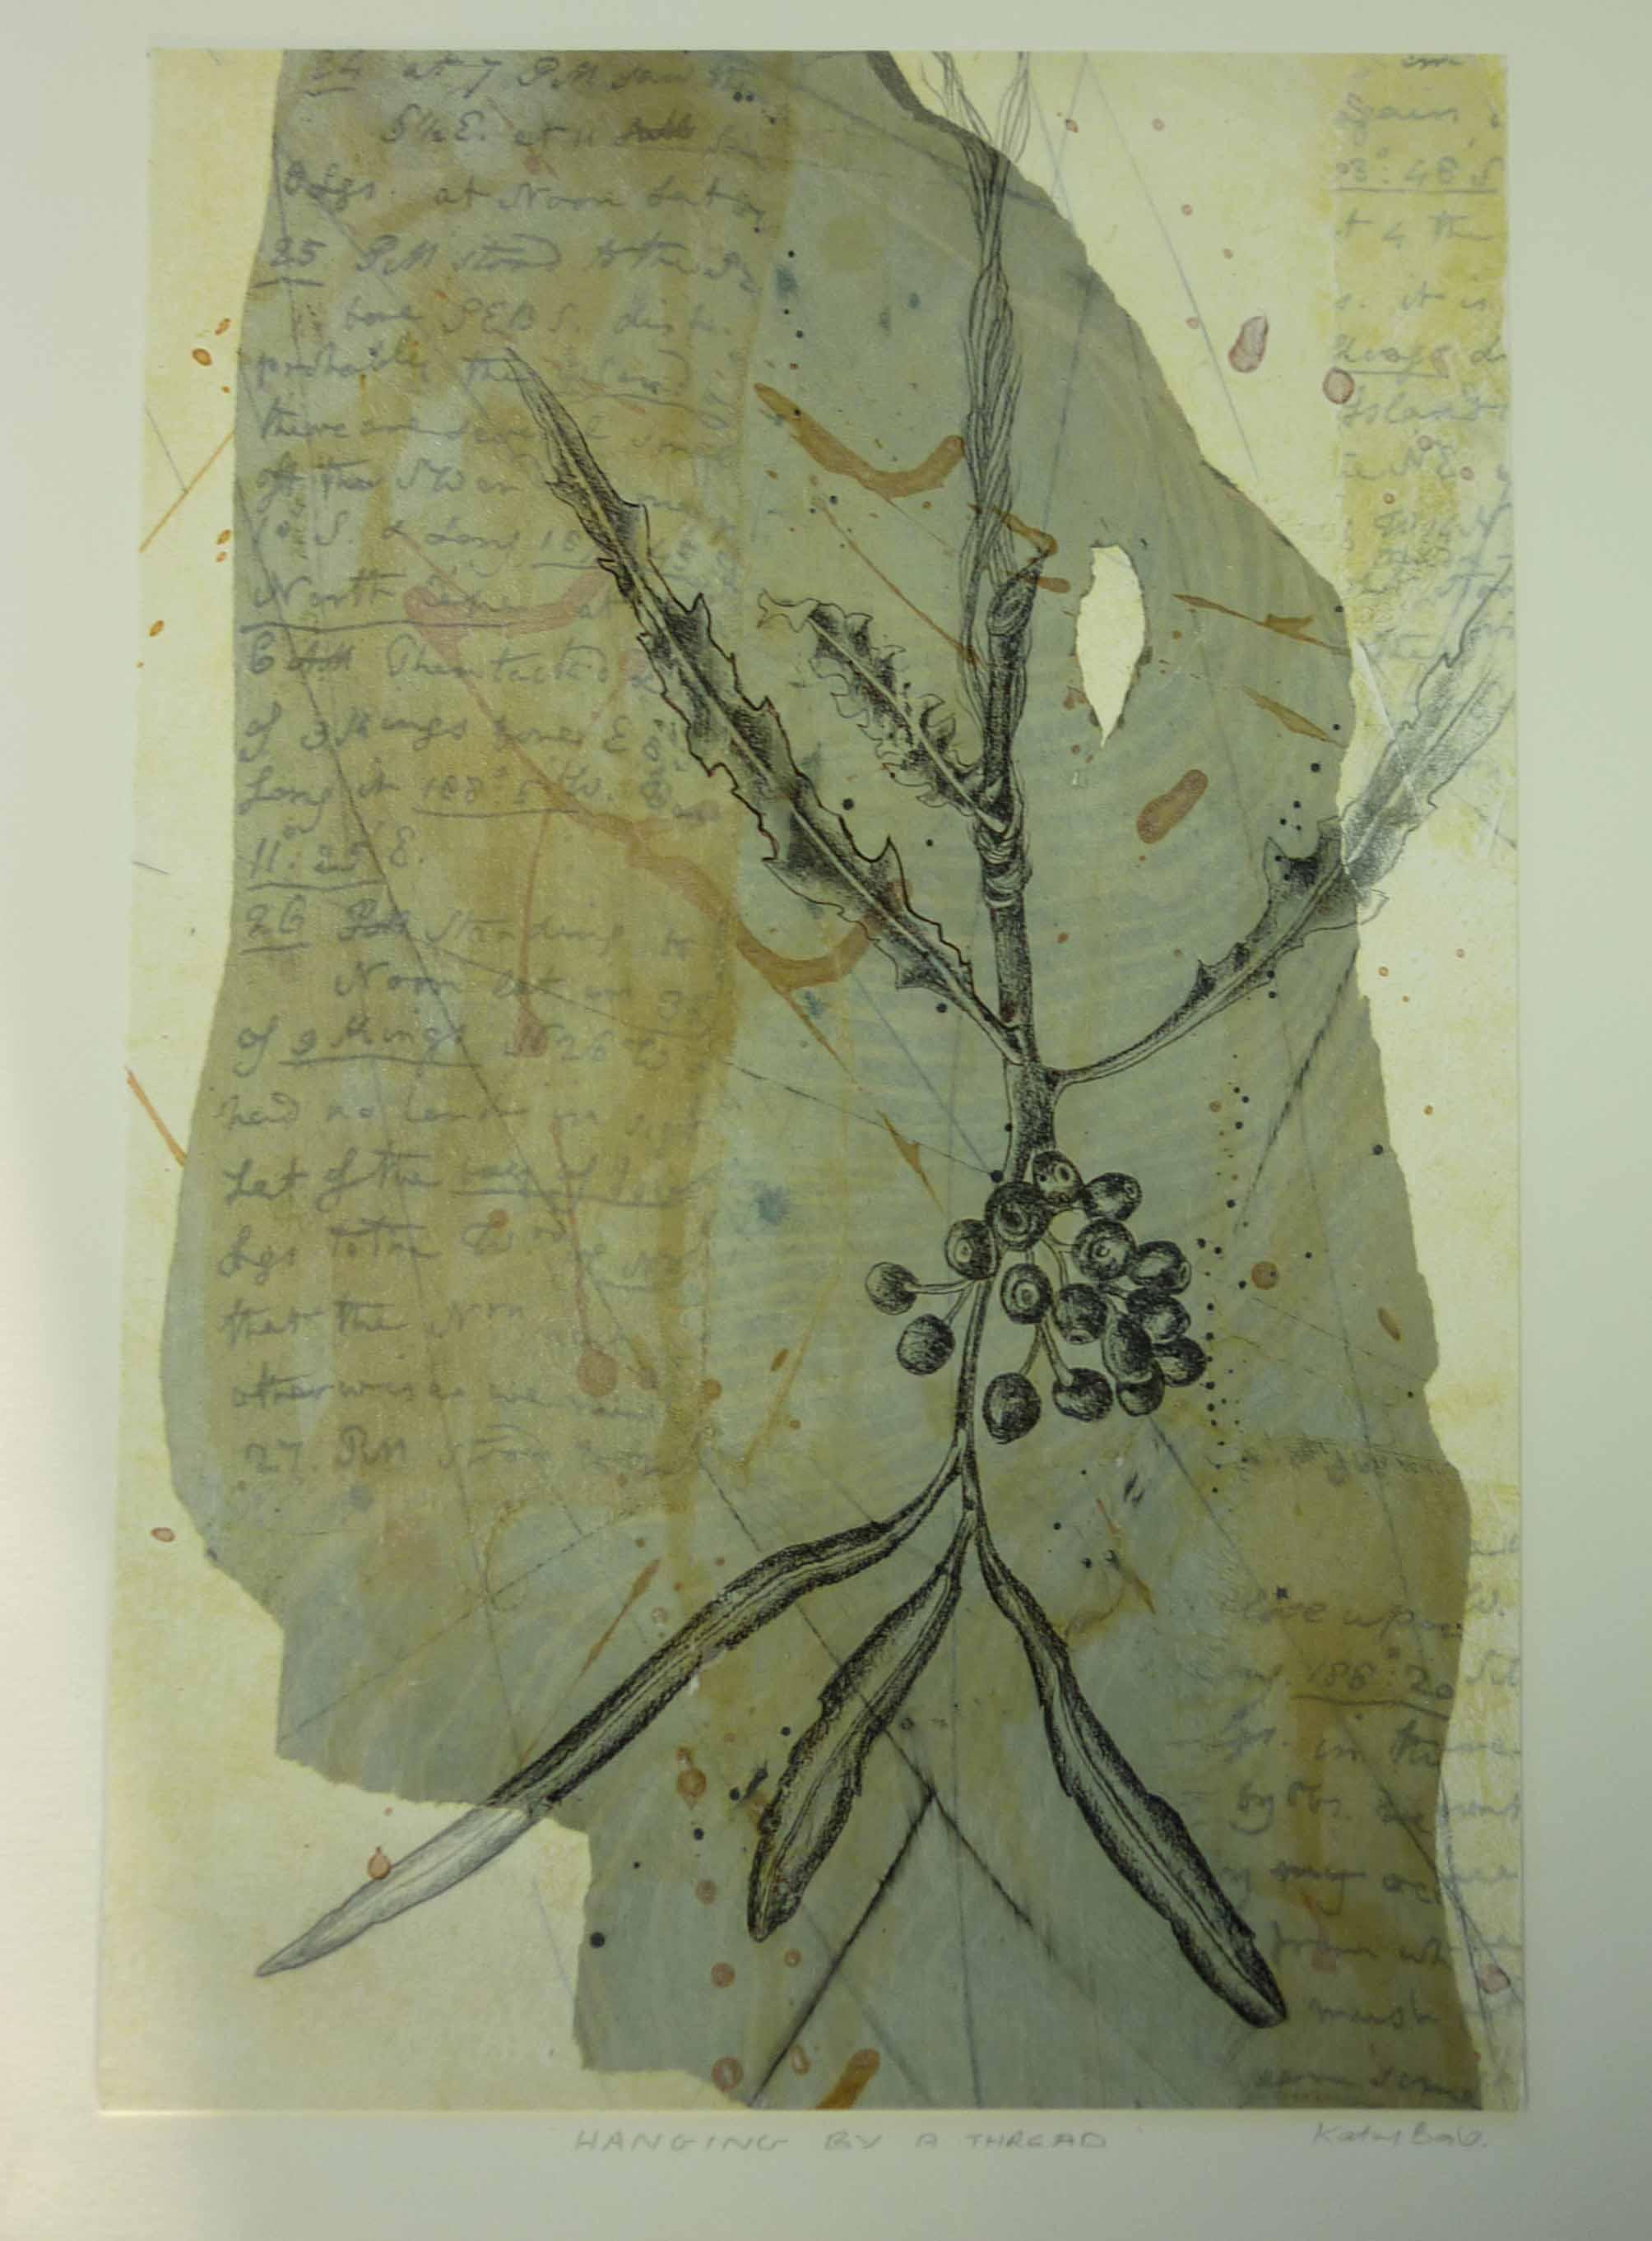 Hanging by a Thread, Kathy Boyle